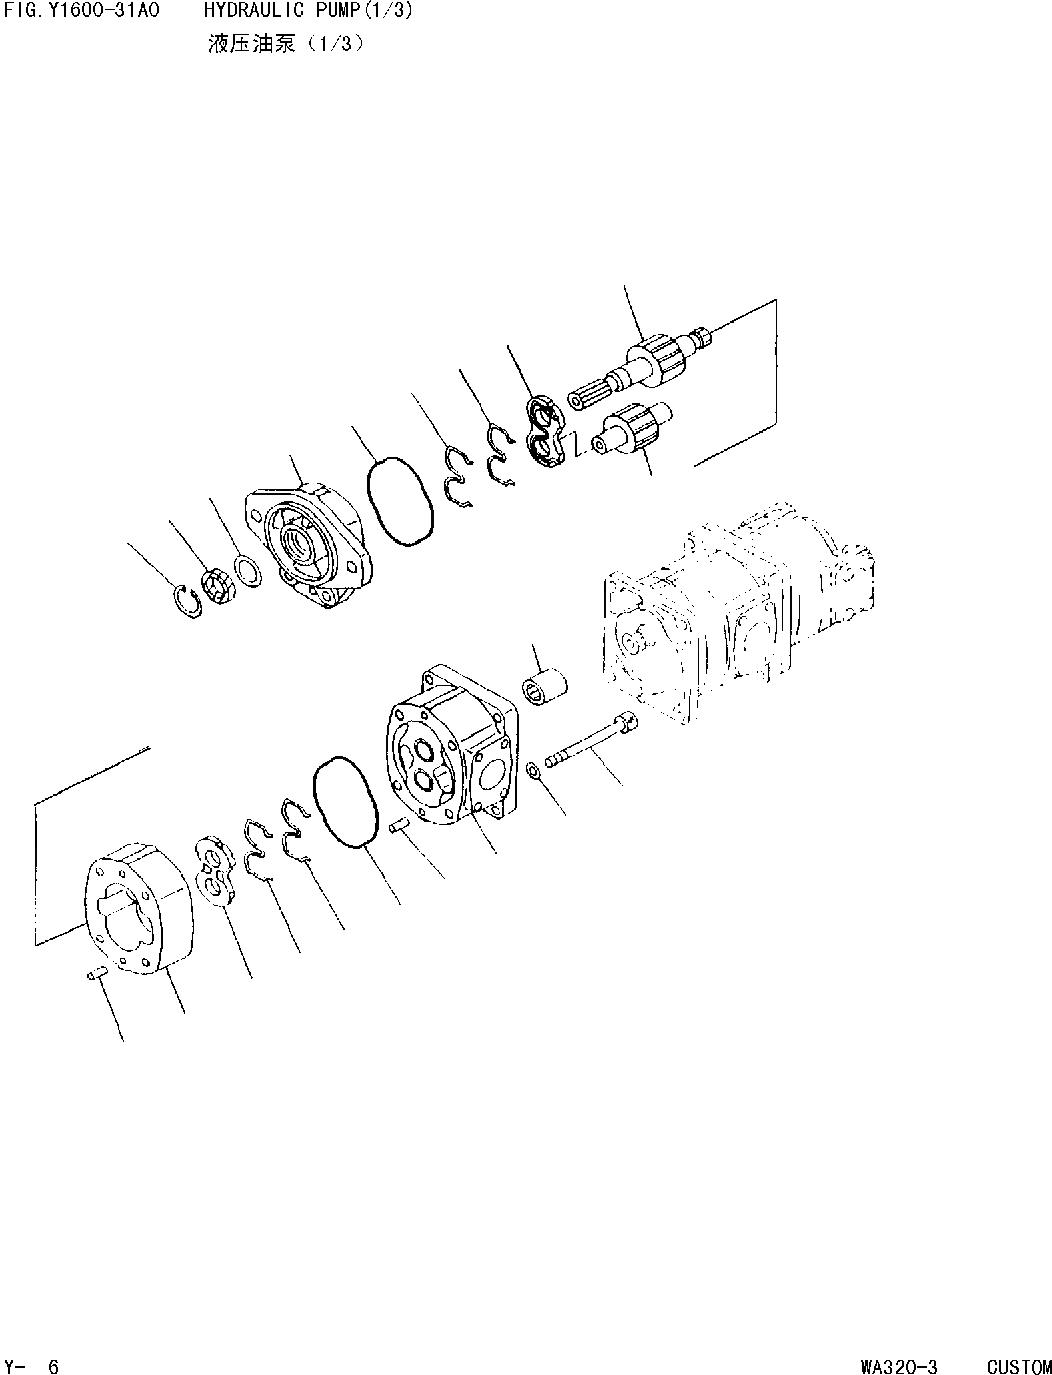 705-17-02830 Komatsu МАСЛОУПЛ. ПРОКЛАДКА